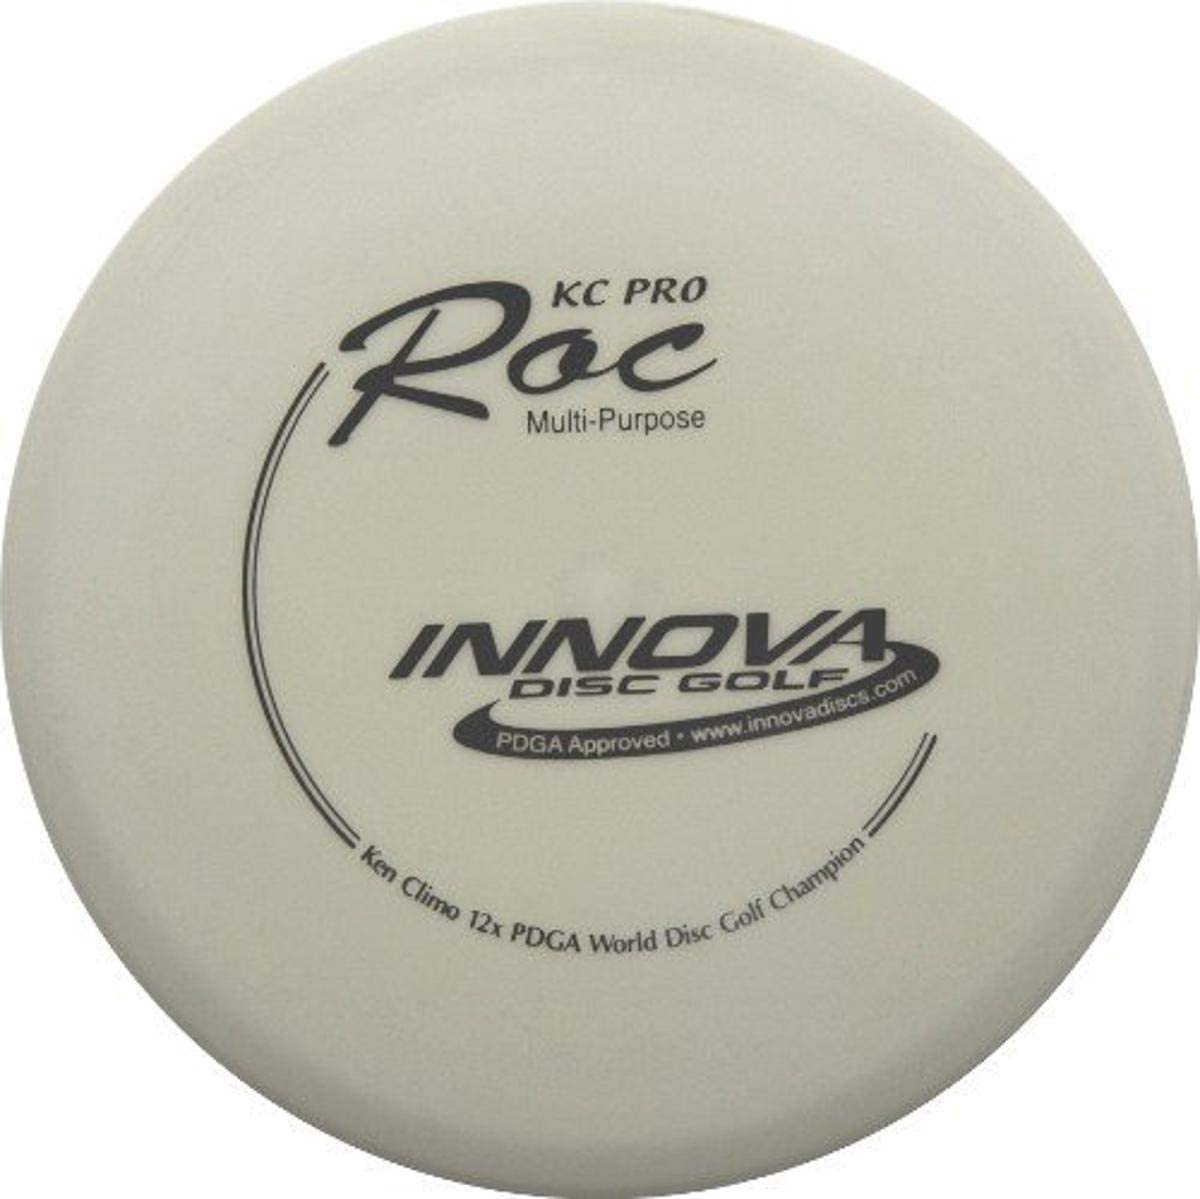 Innova Disc Golf Pro KC Roc Golf Disc (Colors may vary)